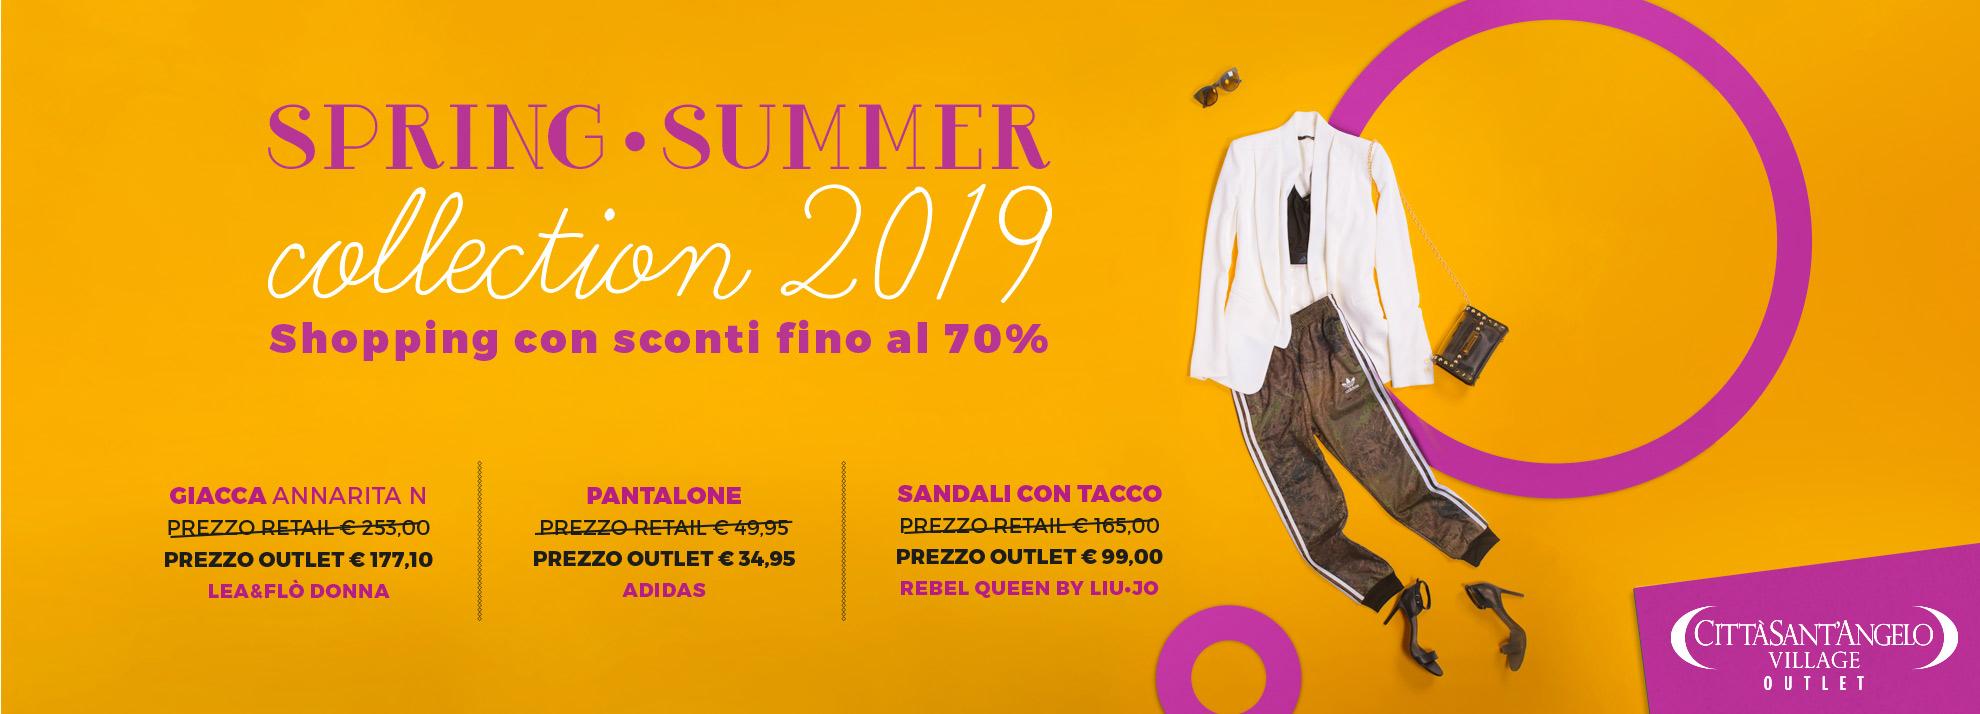 trend moda donna 2019